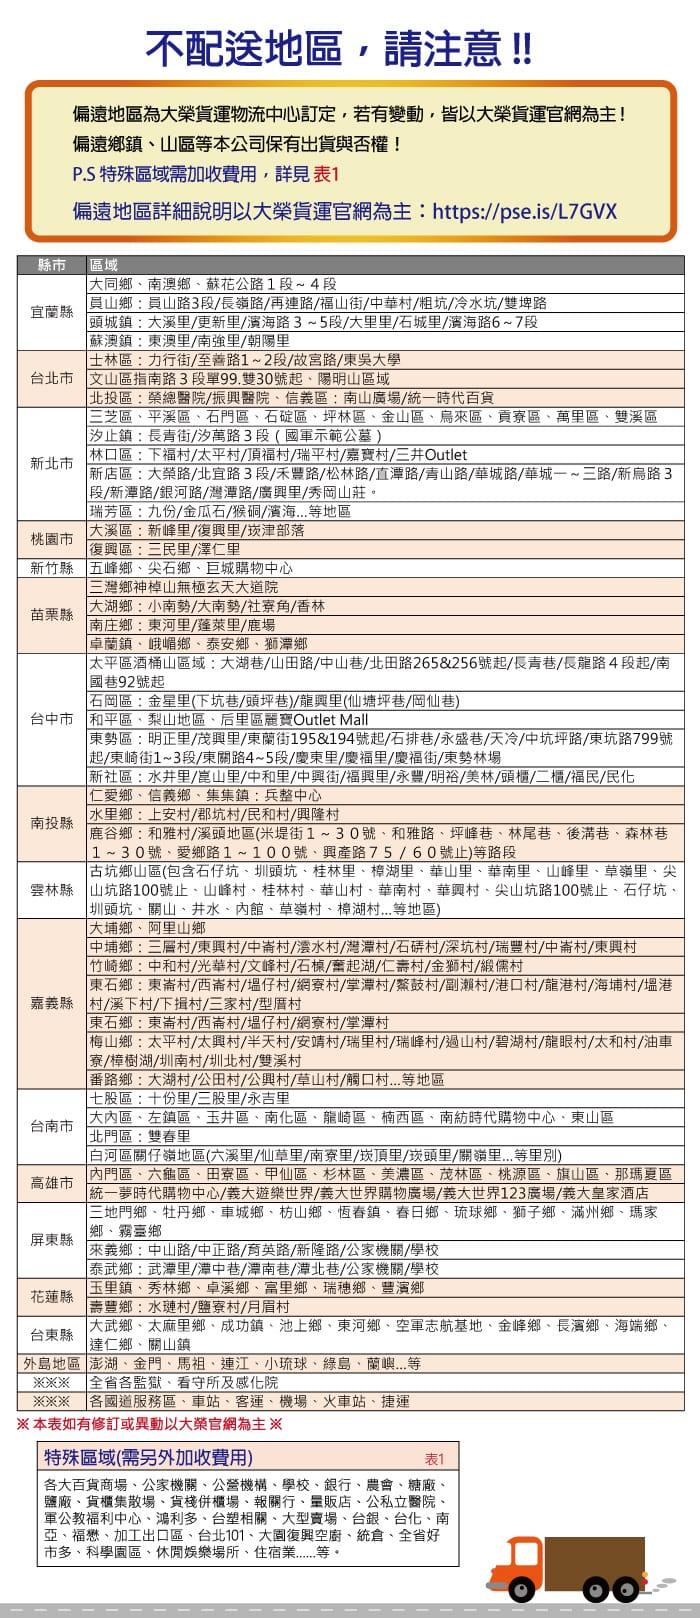 【Kotex靠得住】冰爽涼感衛生棉 小箱購(加送體驗包) 23cm/28cm